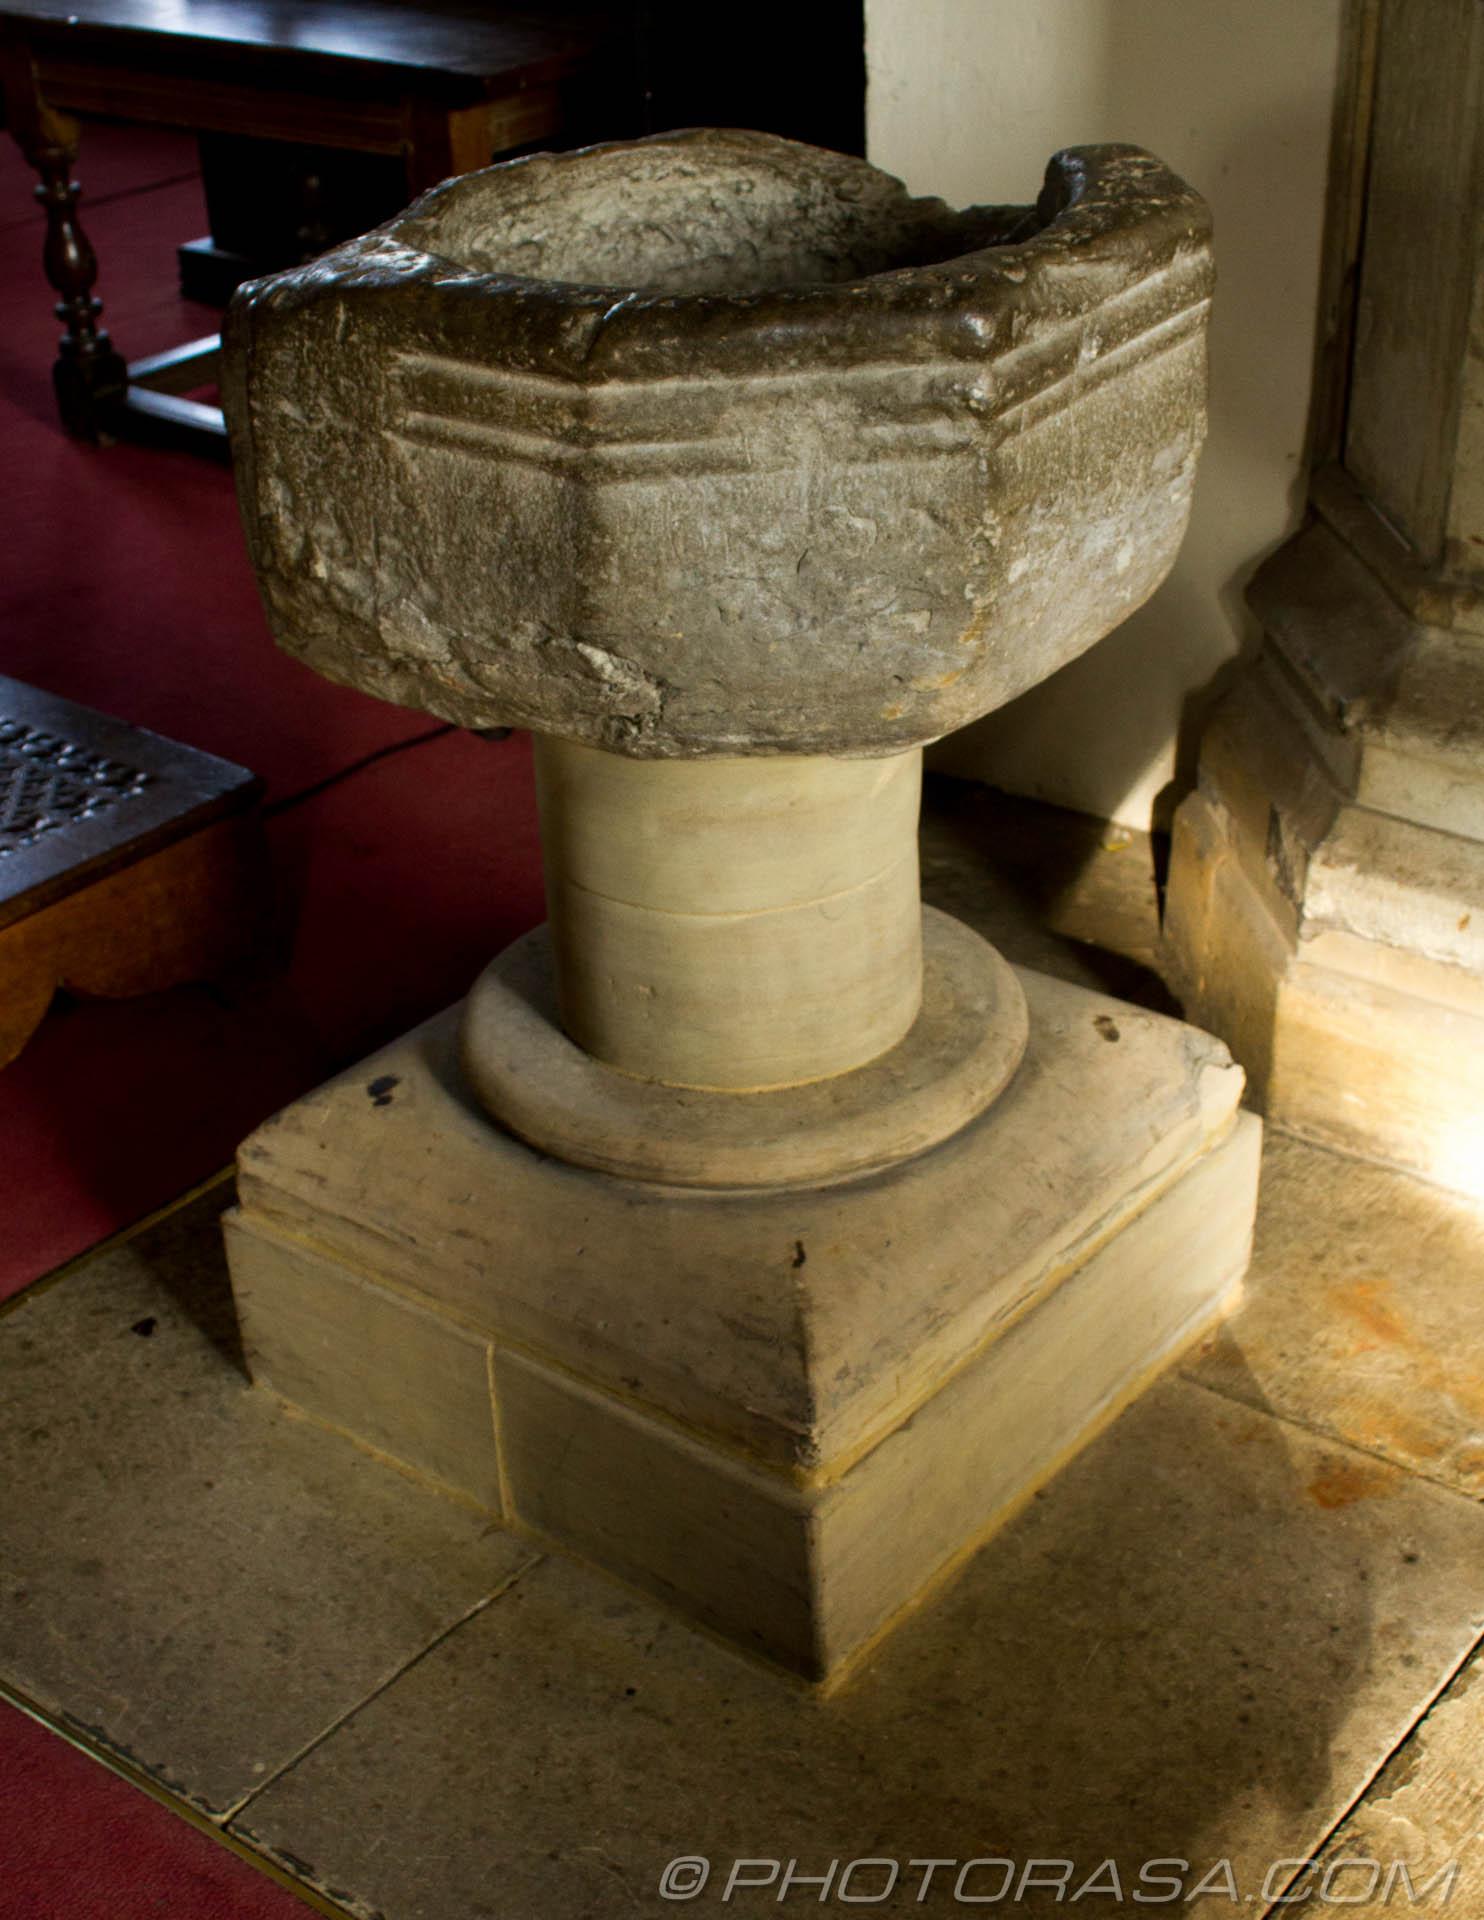 https://photorasa.com/saints-church-staplehurst-kent/medieval-font/